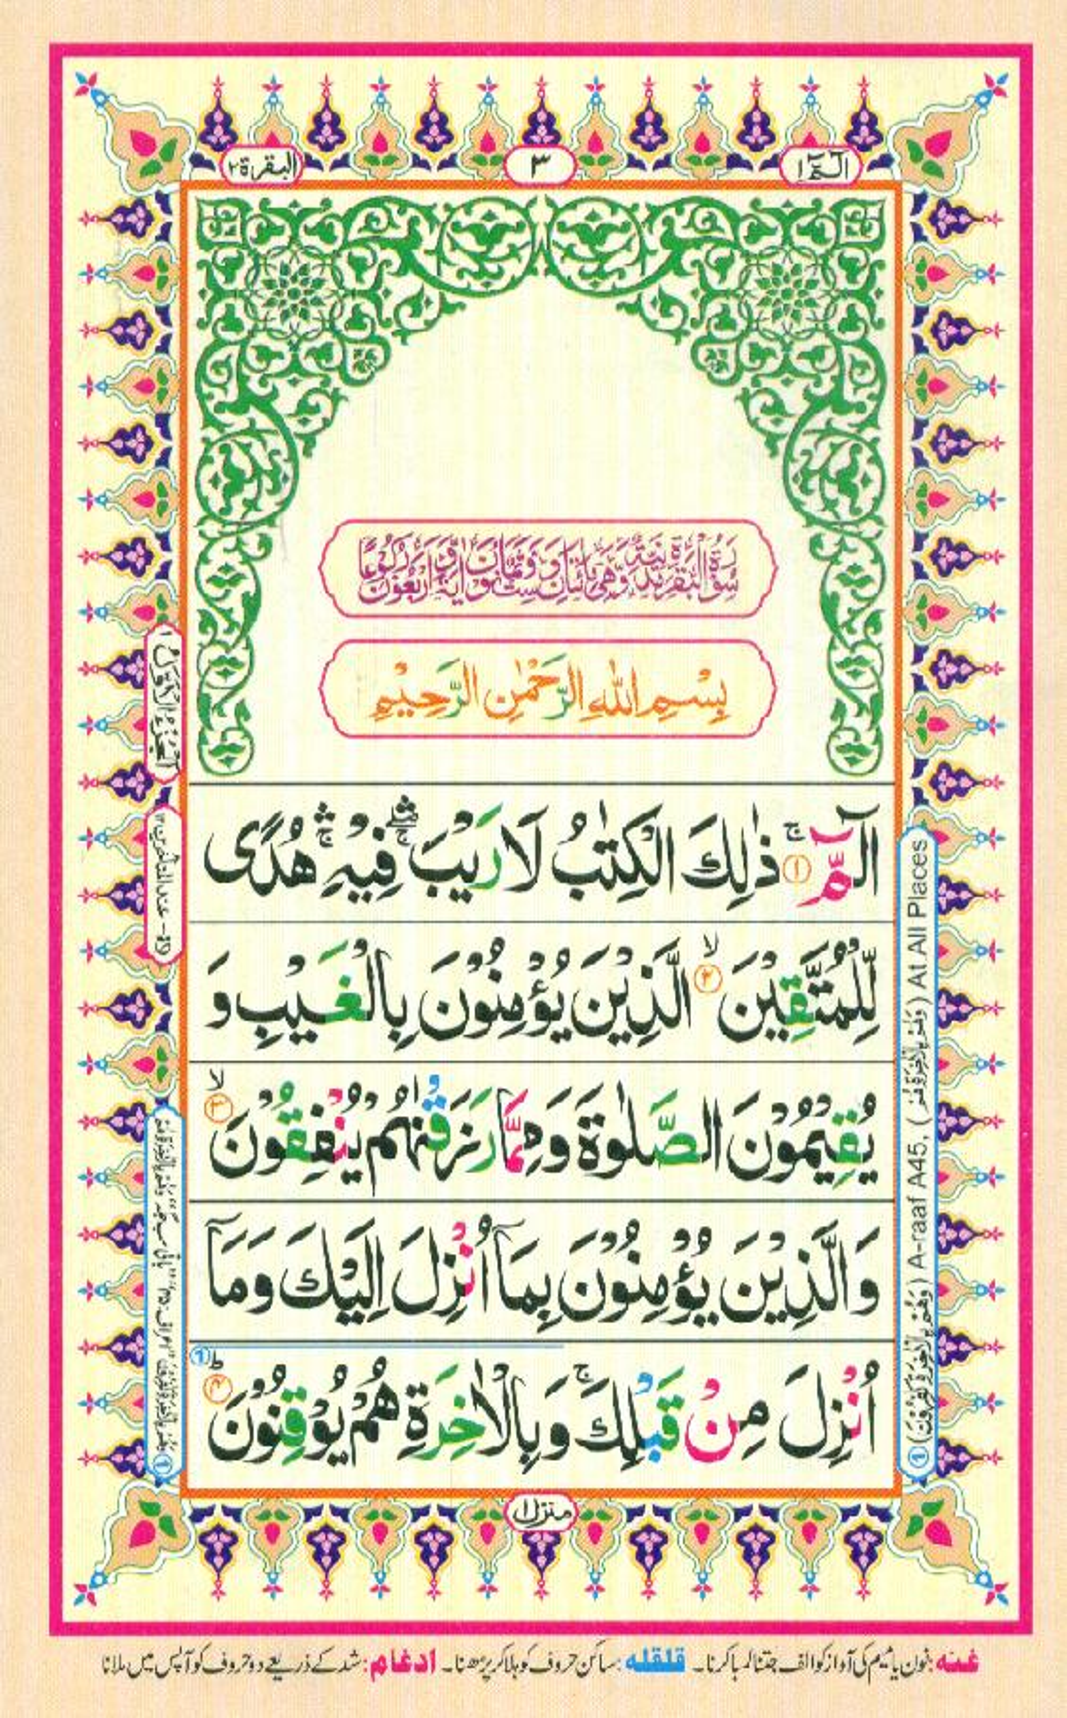 Quran Wallpaper Hd In urdu Gallery Iphhone Download Tumblr